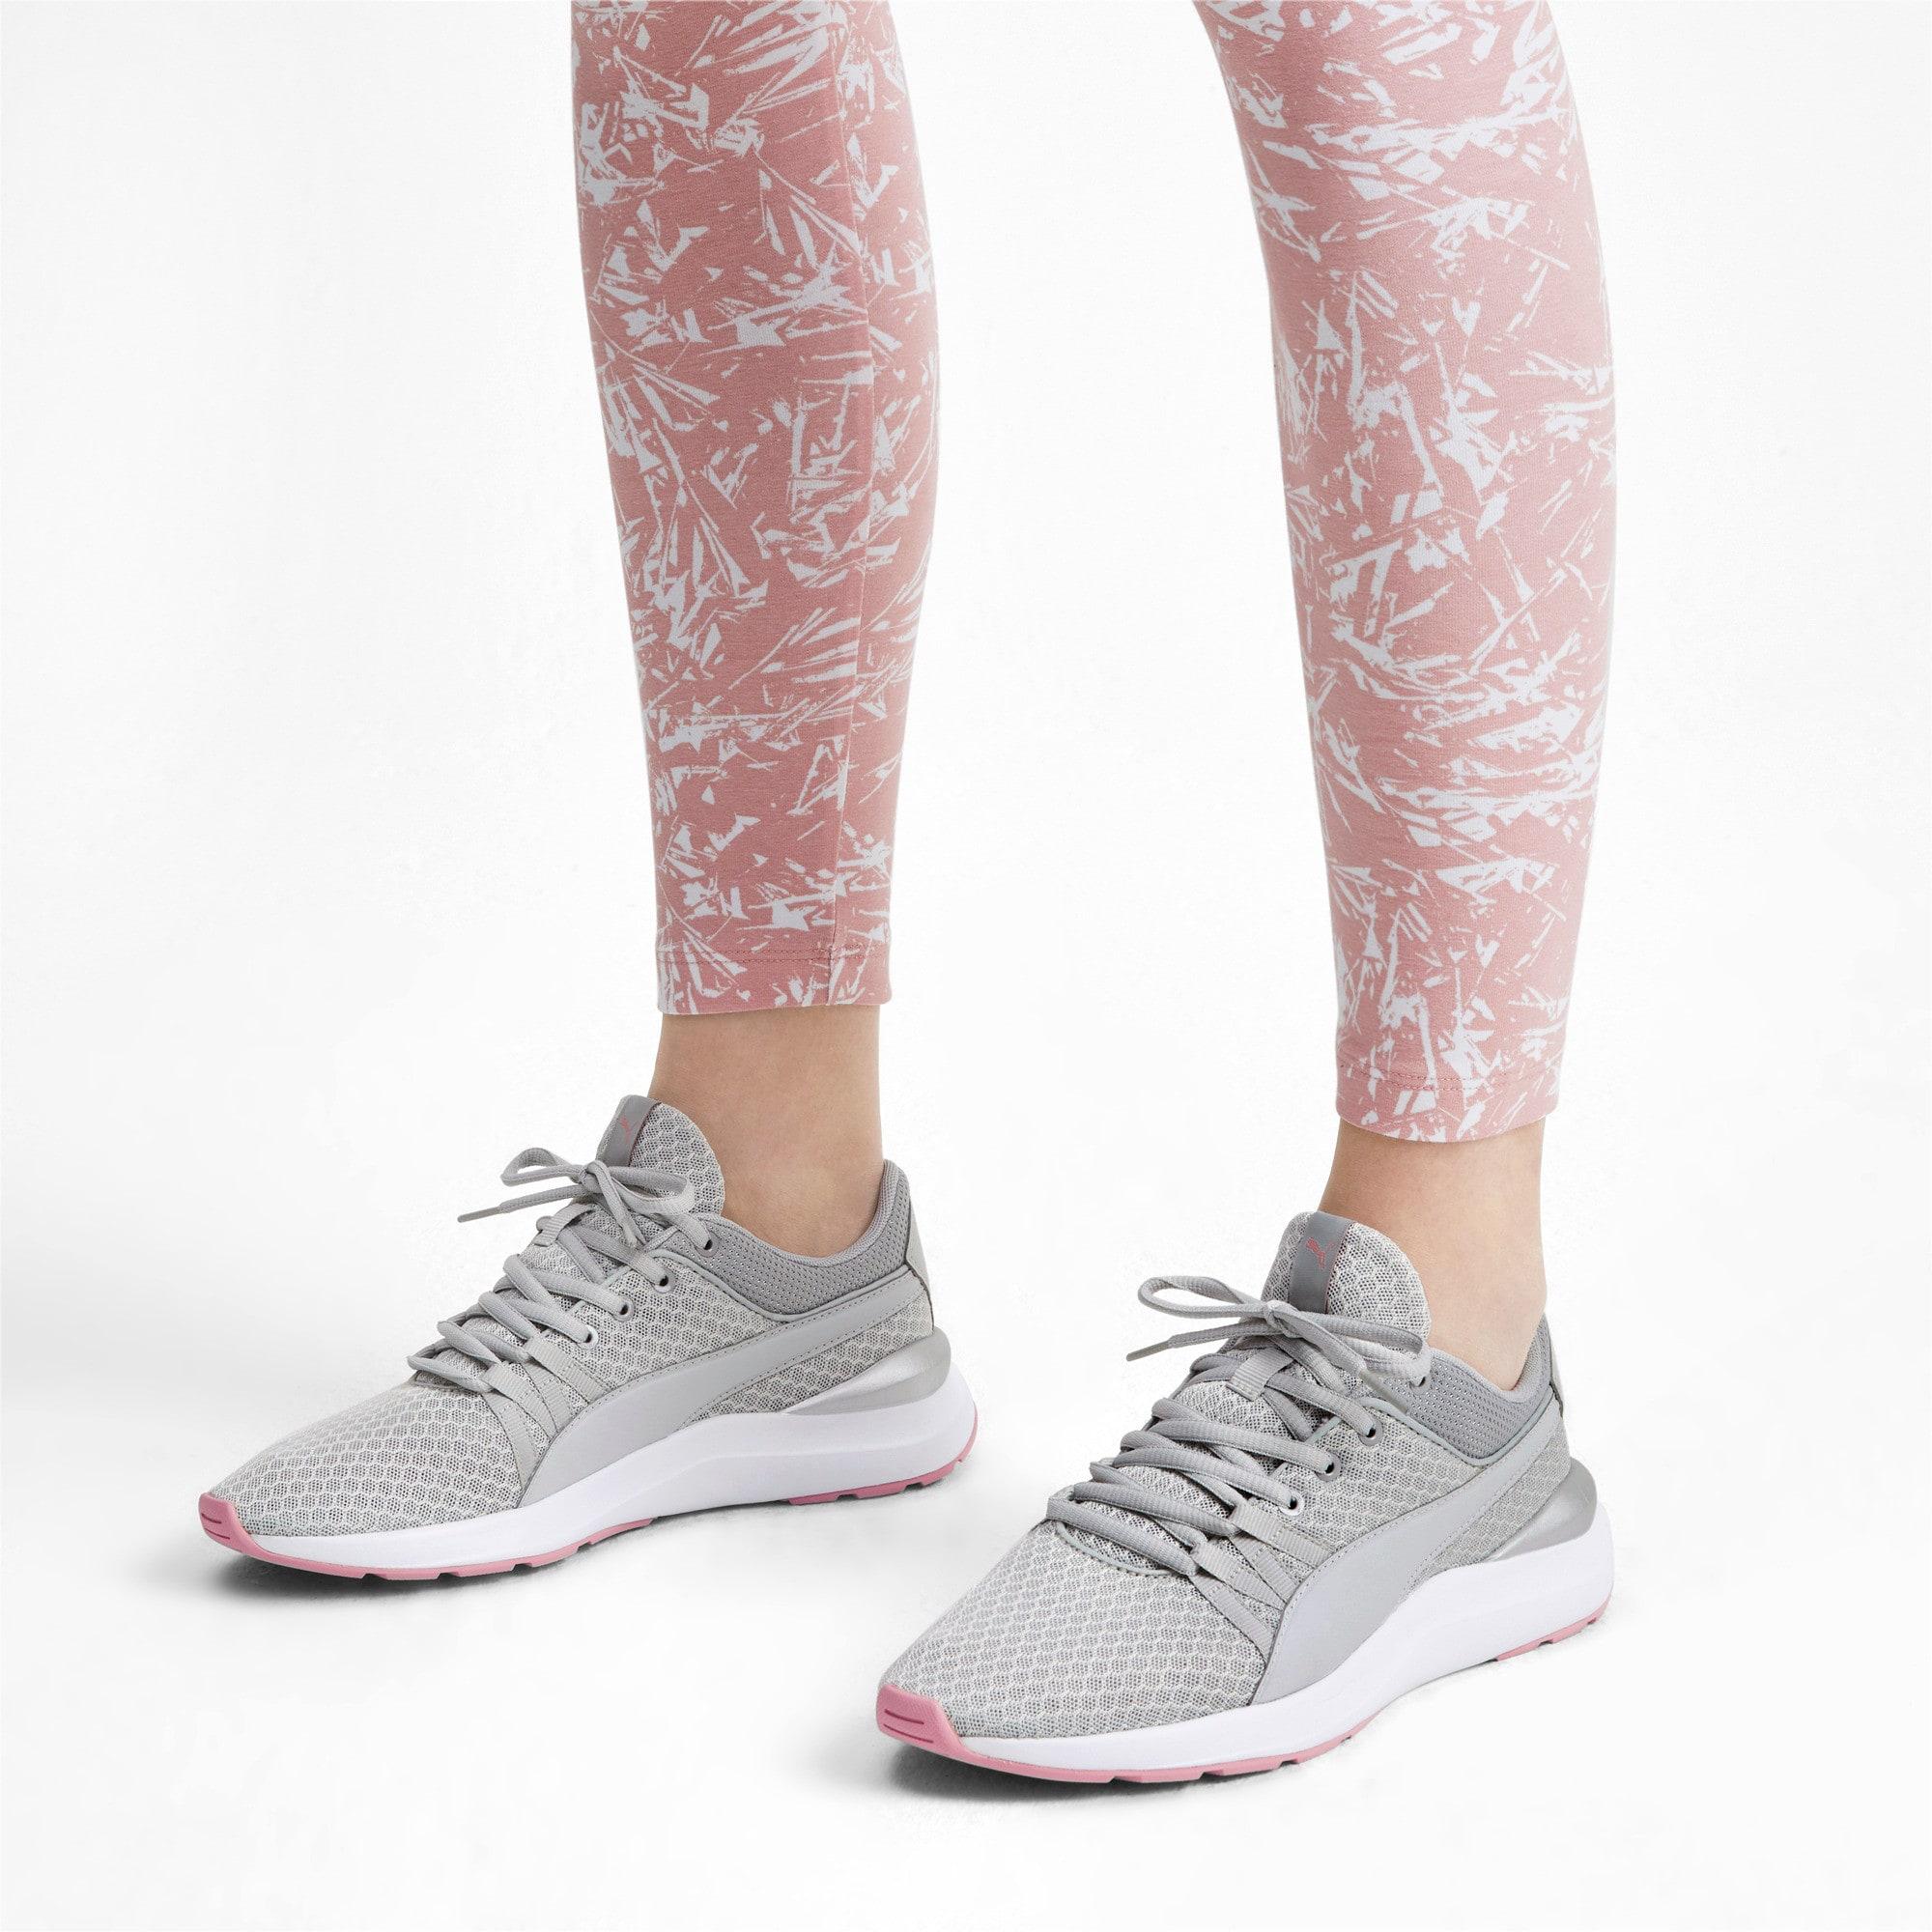 Thumbnail 2 of Adela Core Women's Sneakers, Gray Violet-Puma Silver, medium